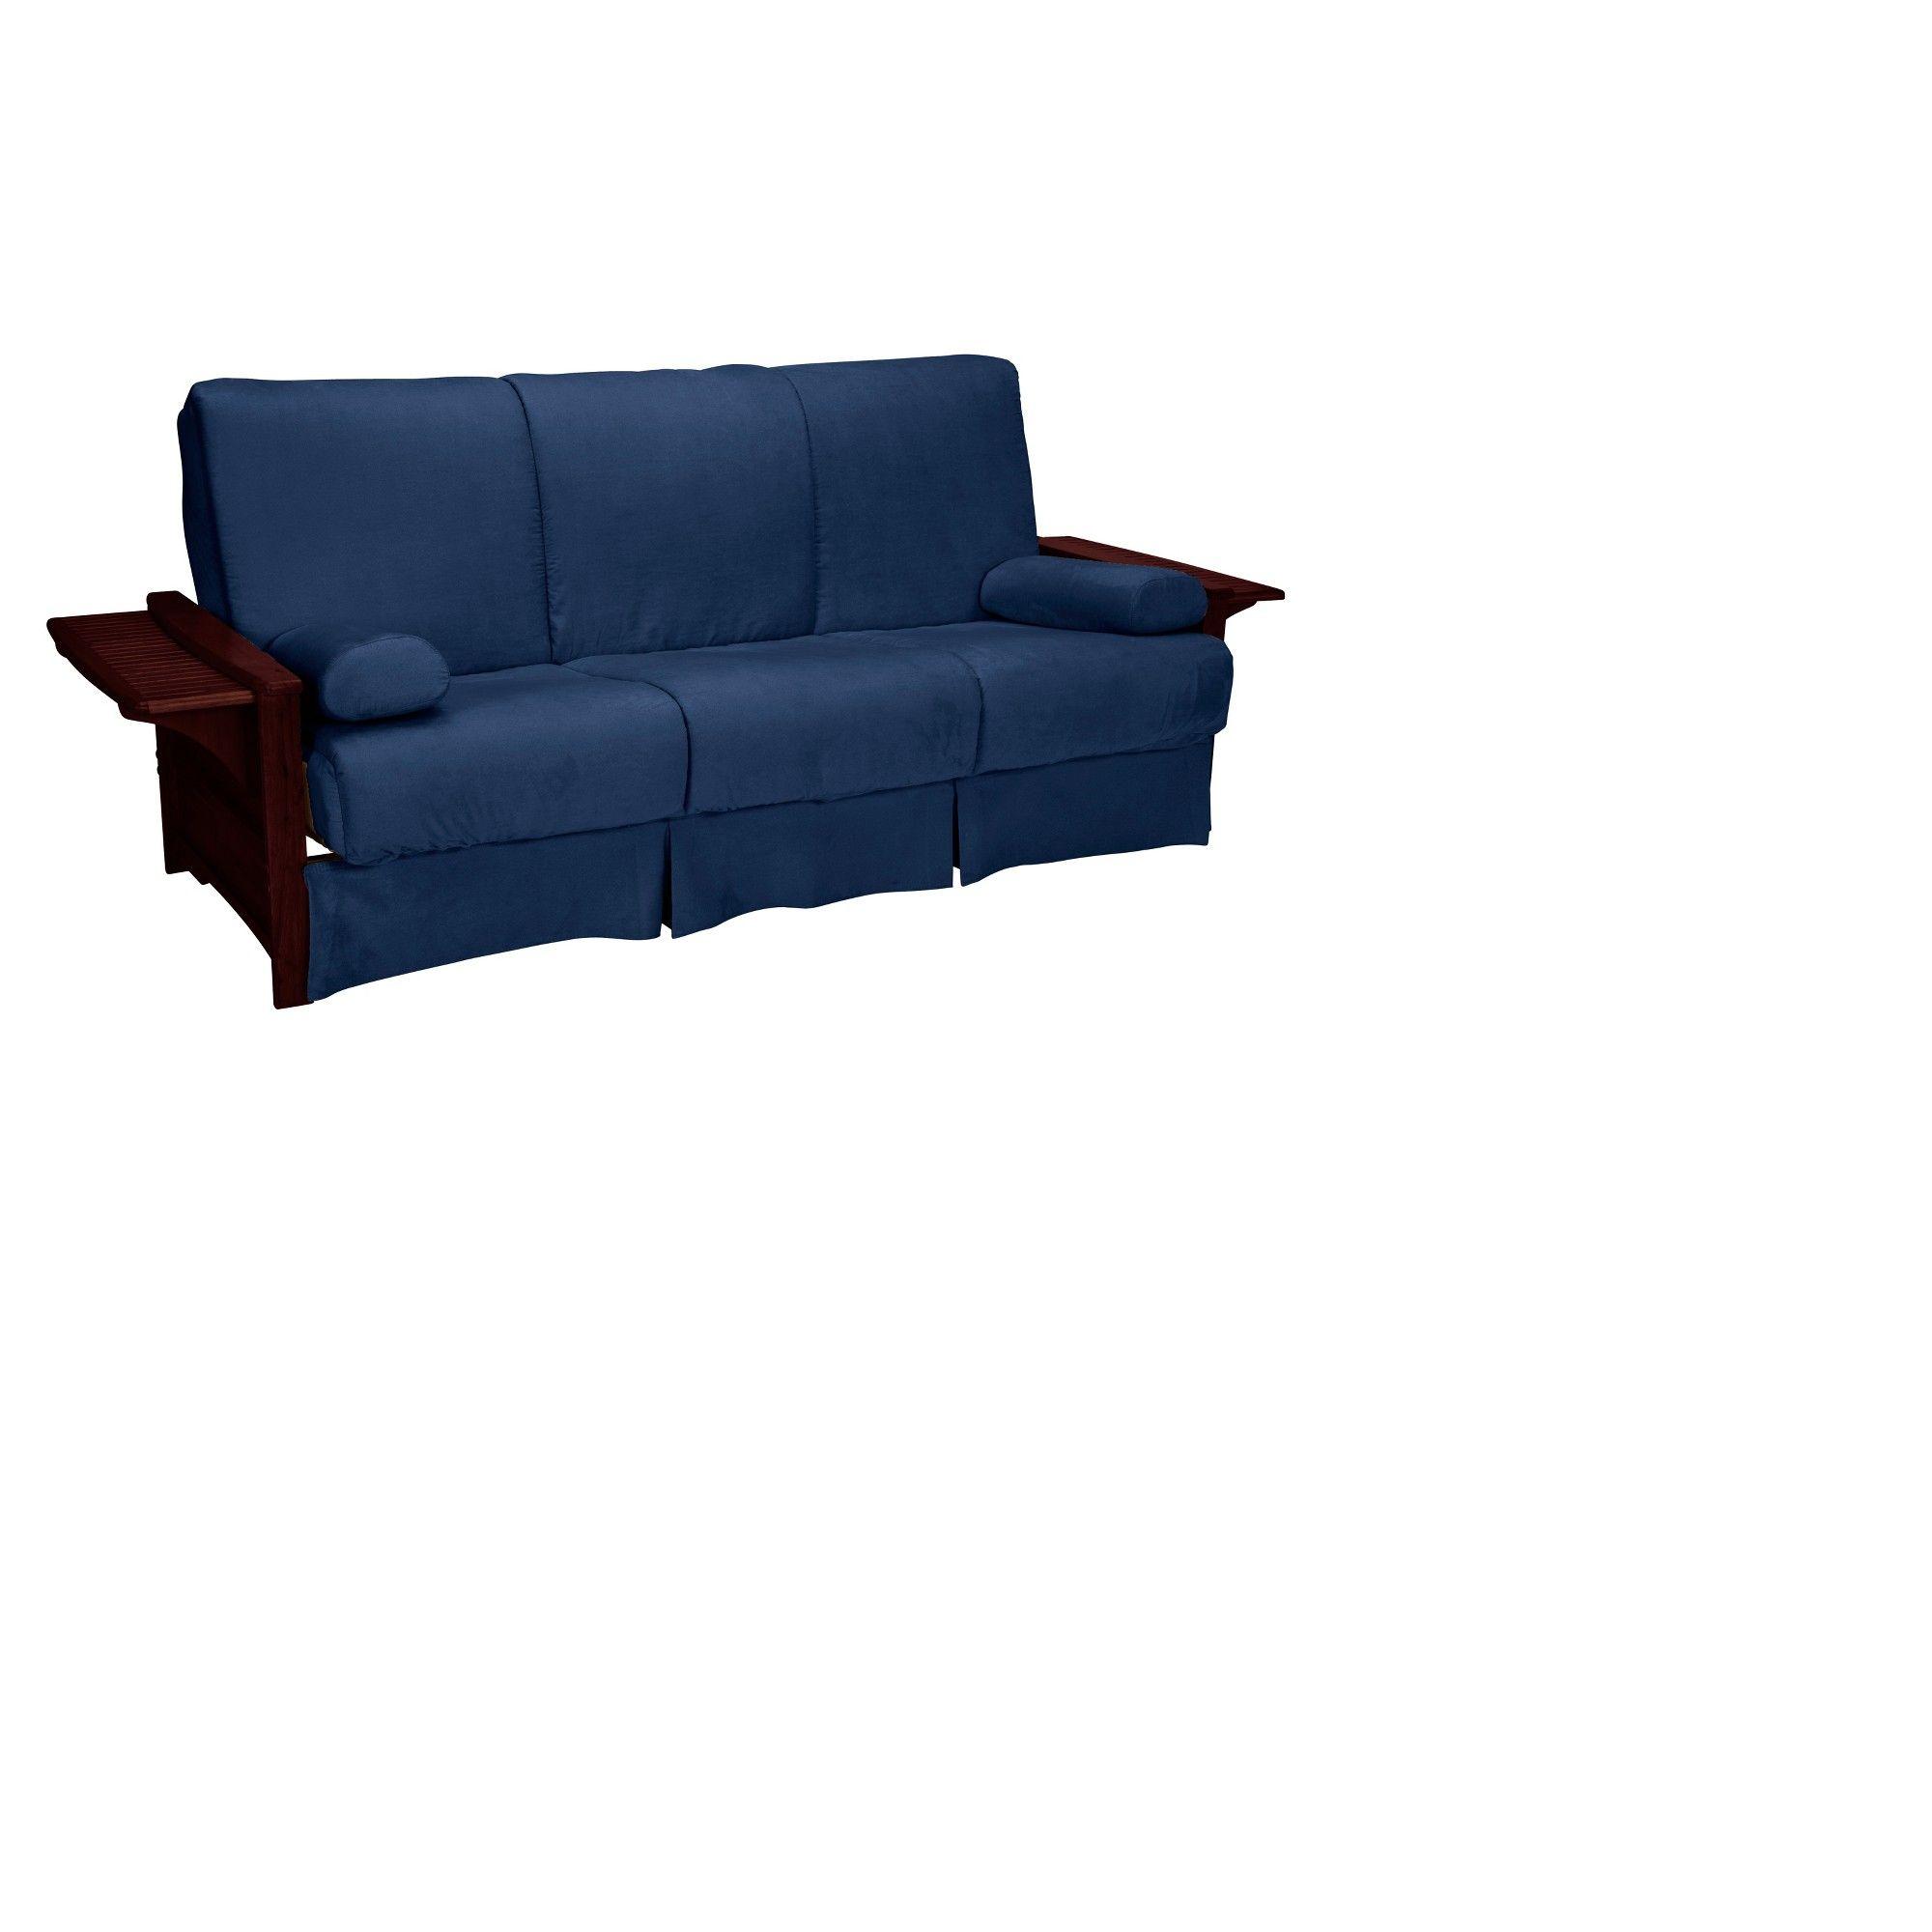 Brooklyn Perfect Futon Sofa Sleeper Mahogany Wood Finish Dark Blue Upholstery Queen